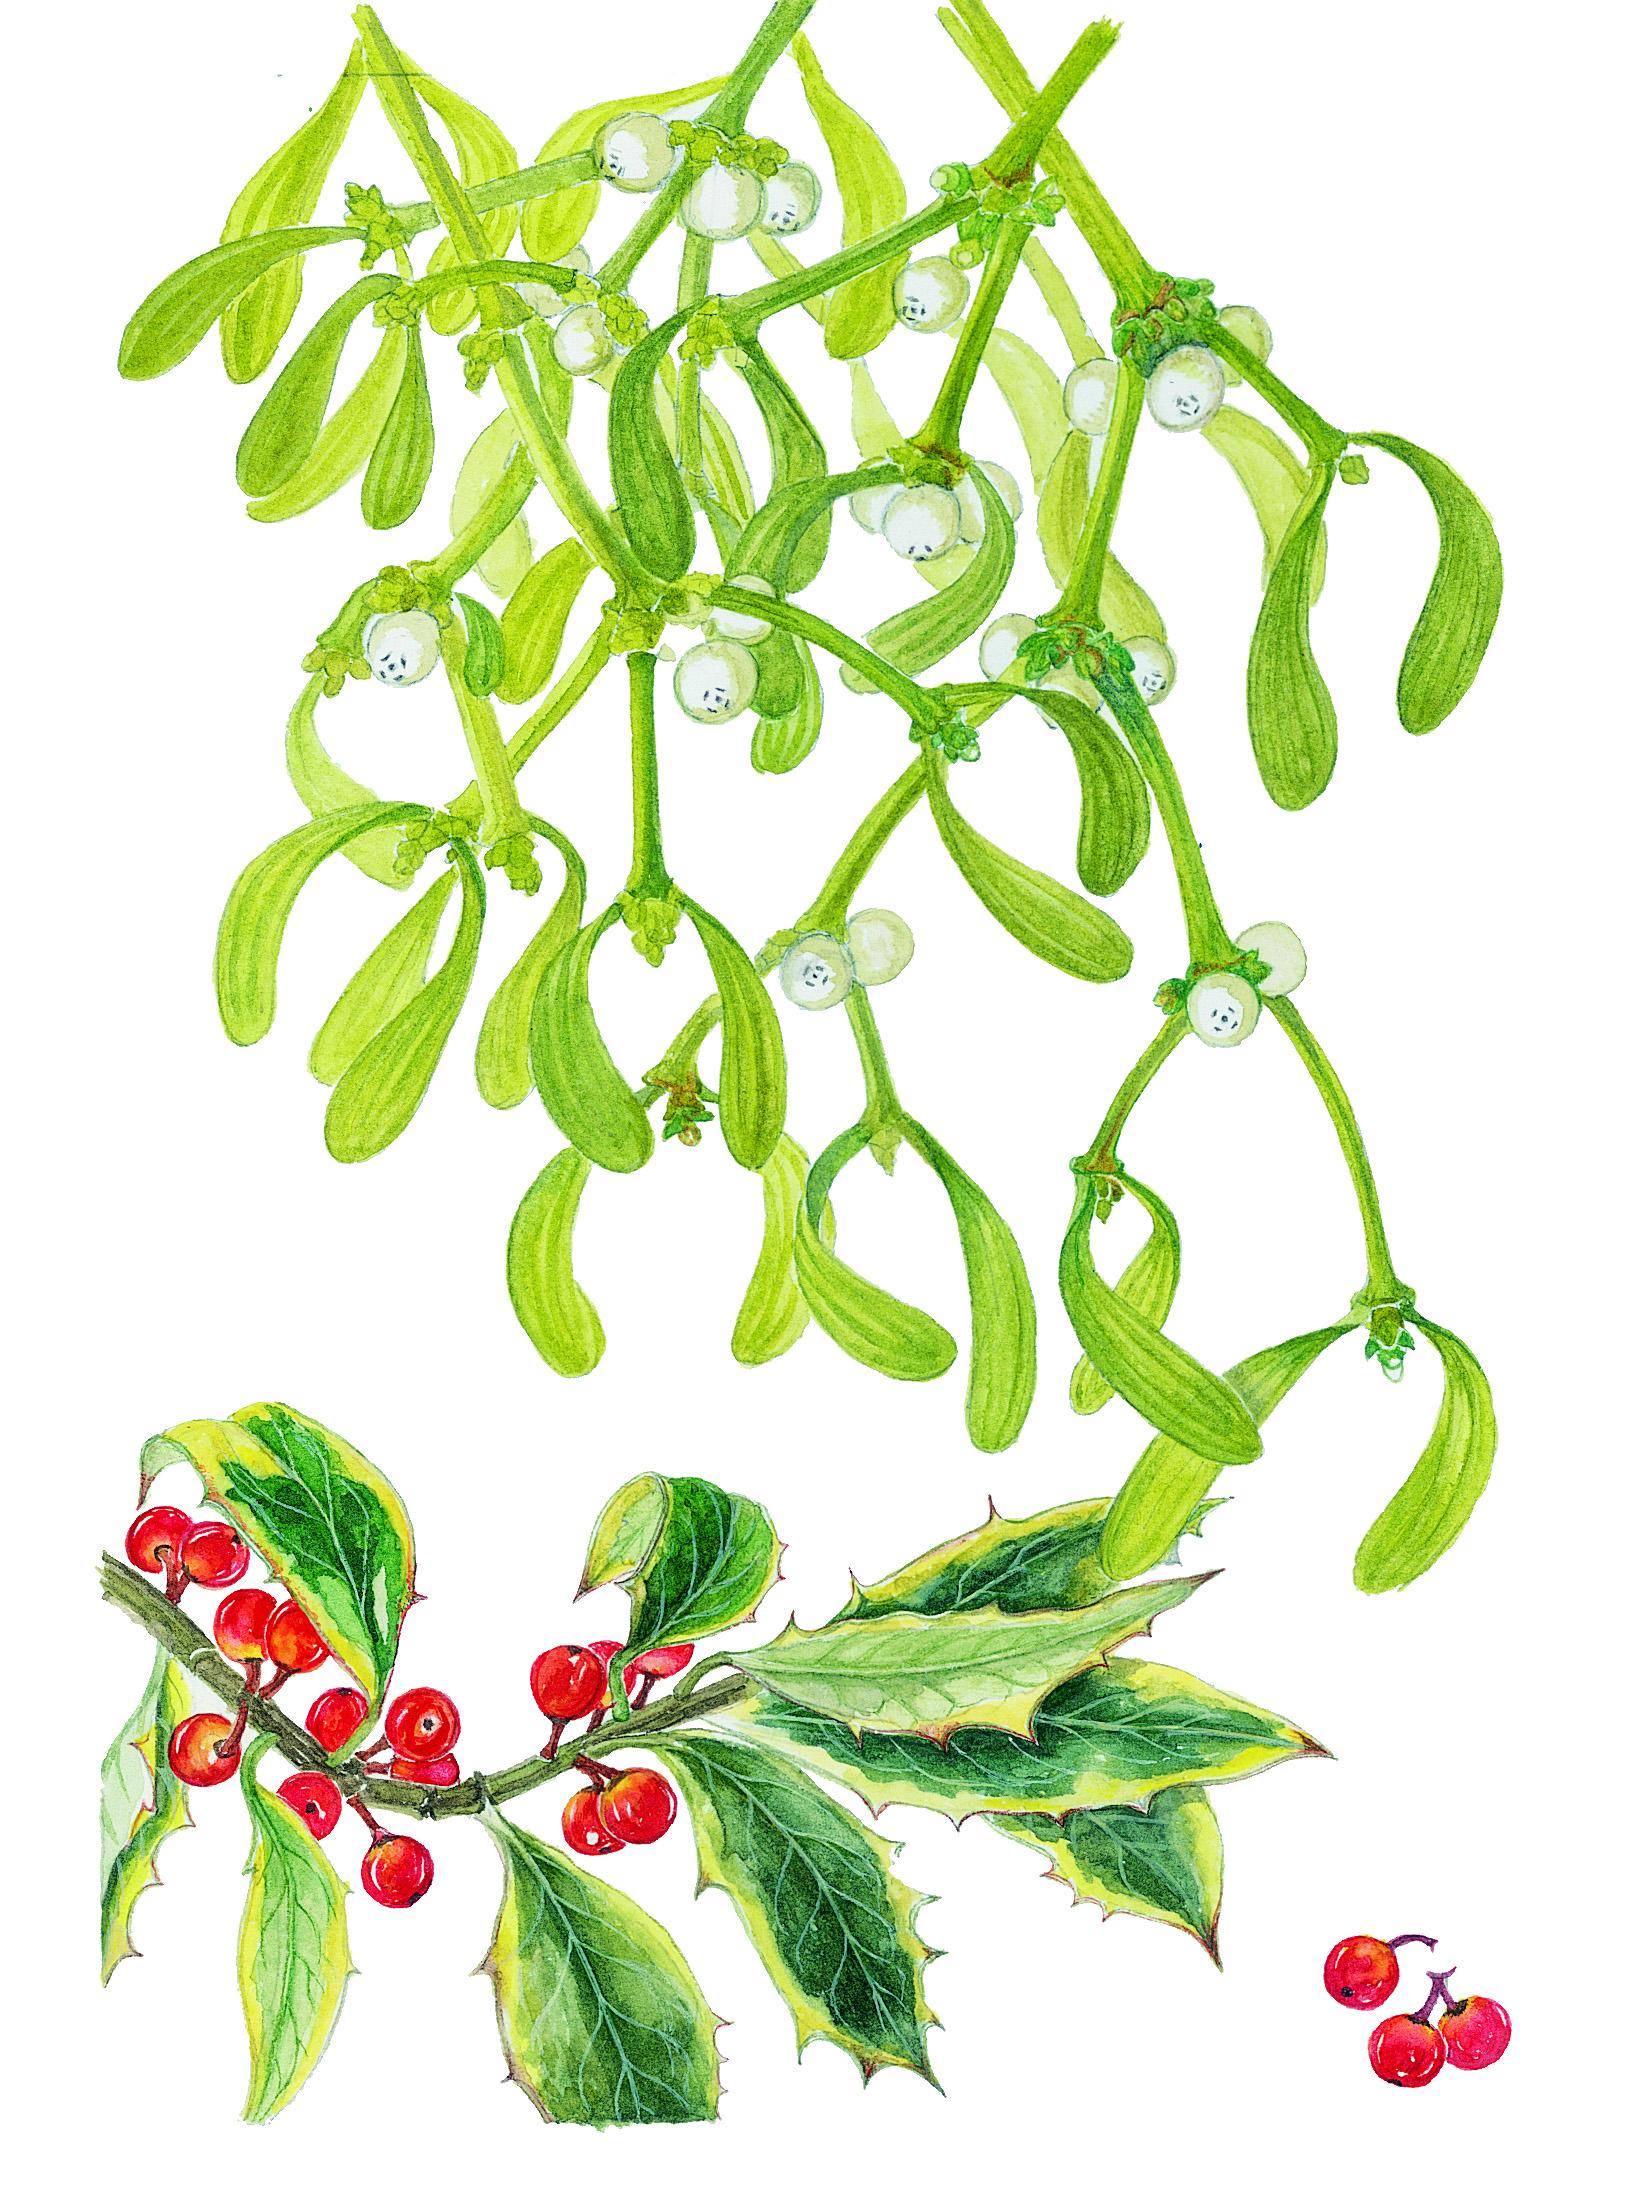 Mistletoe & Holly